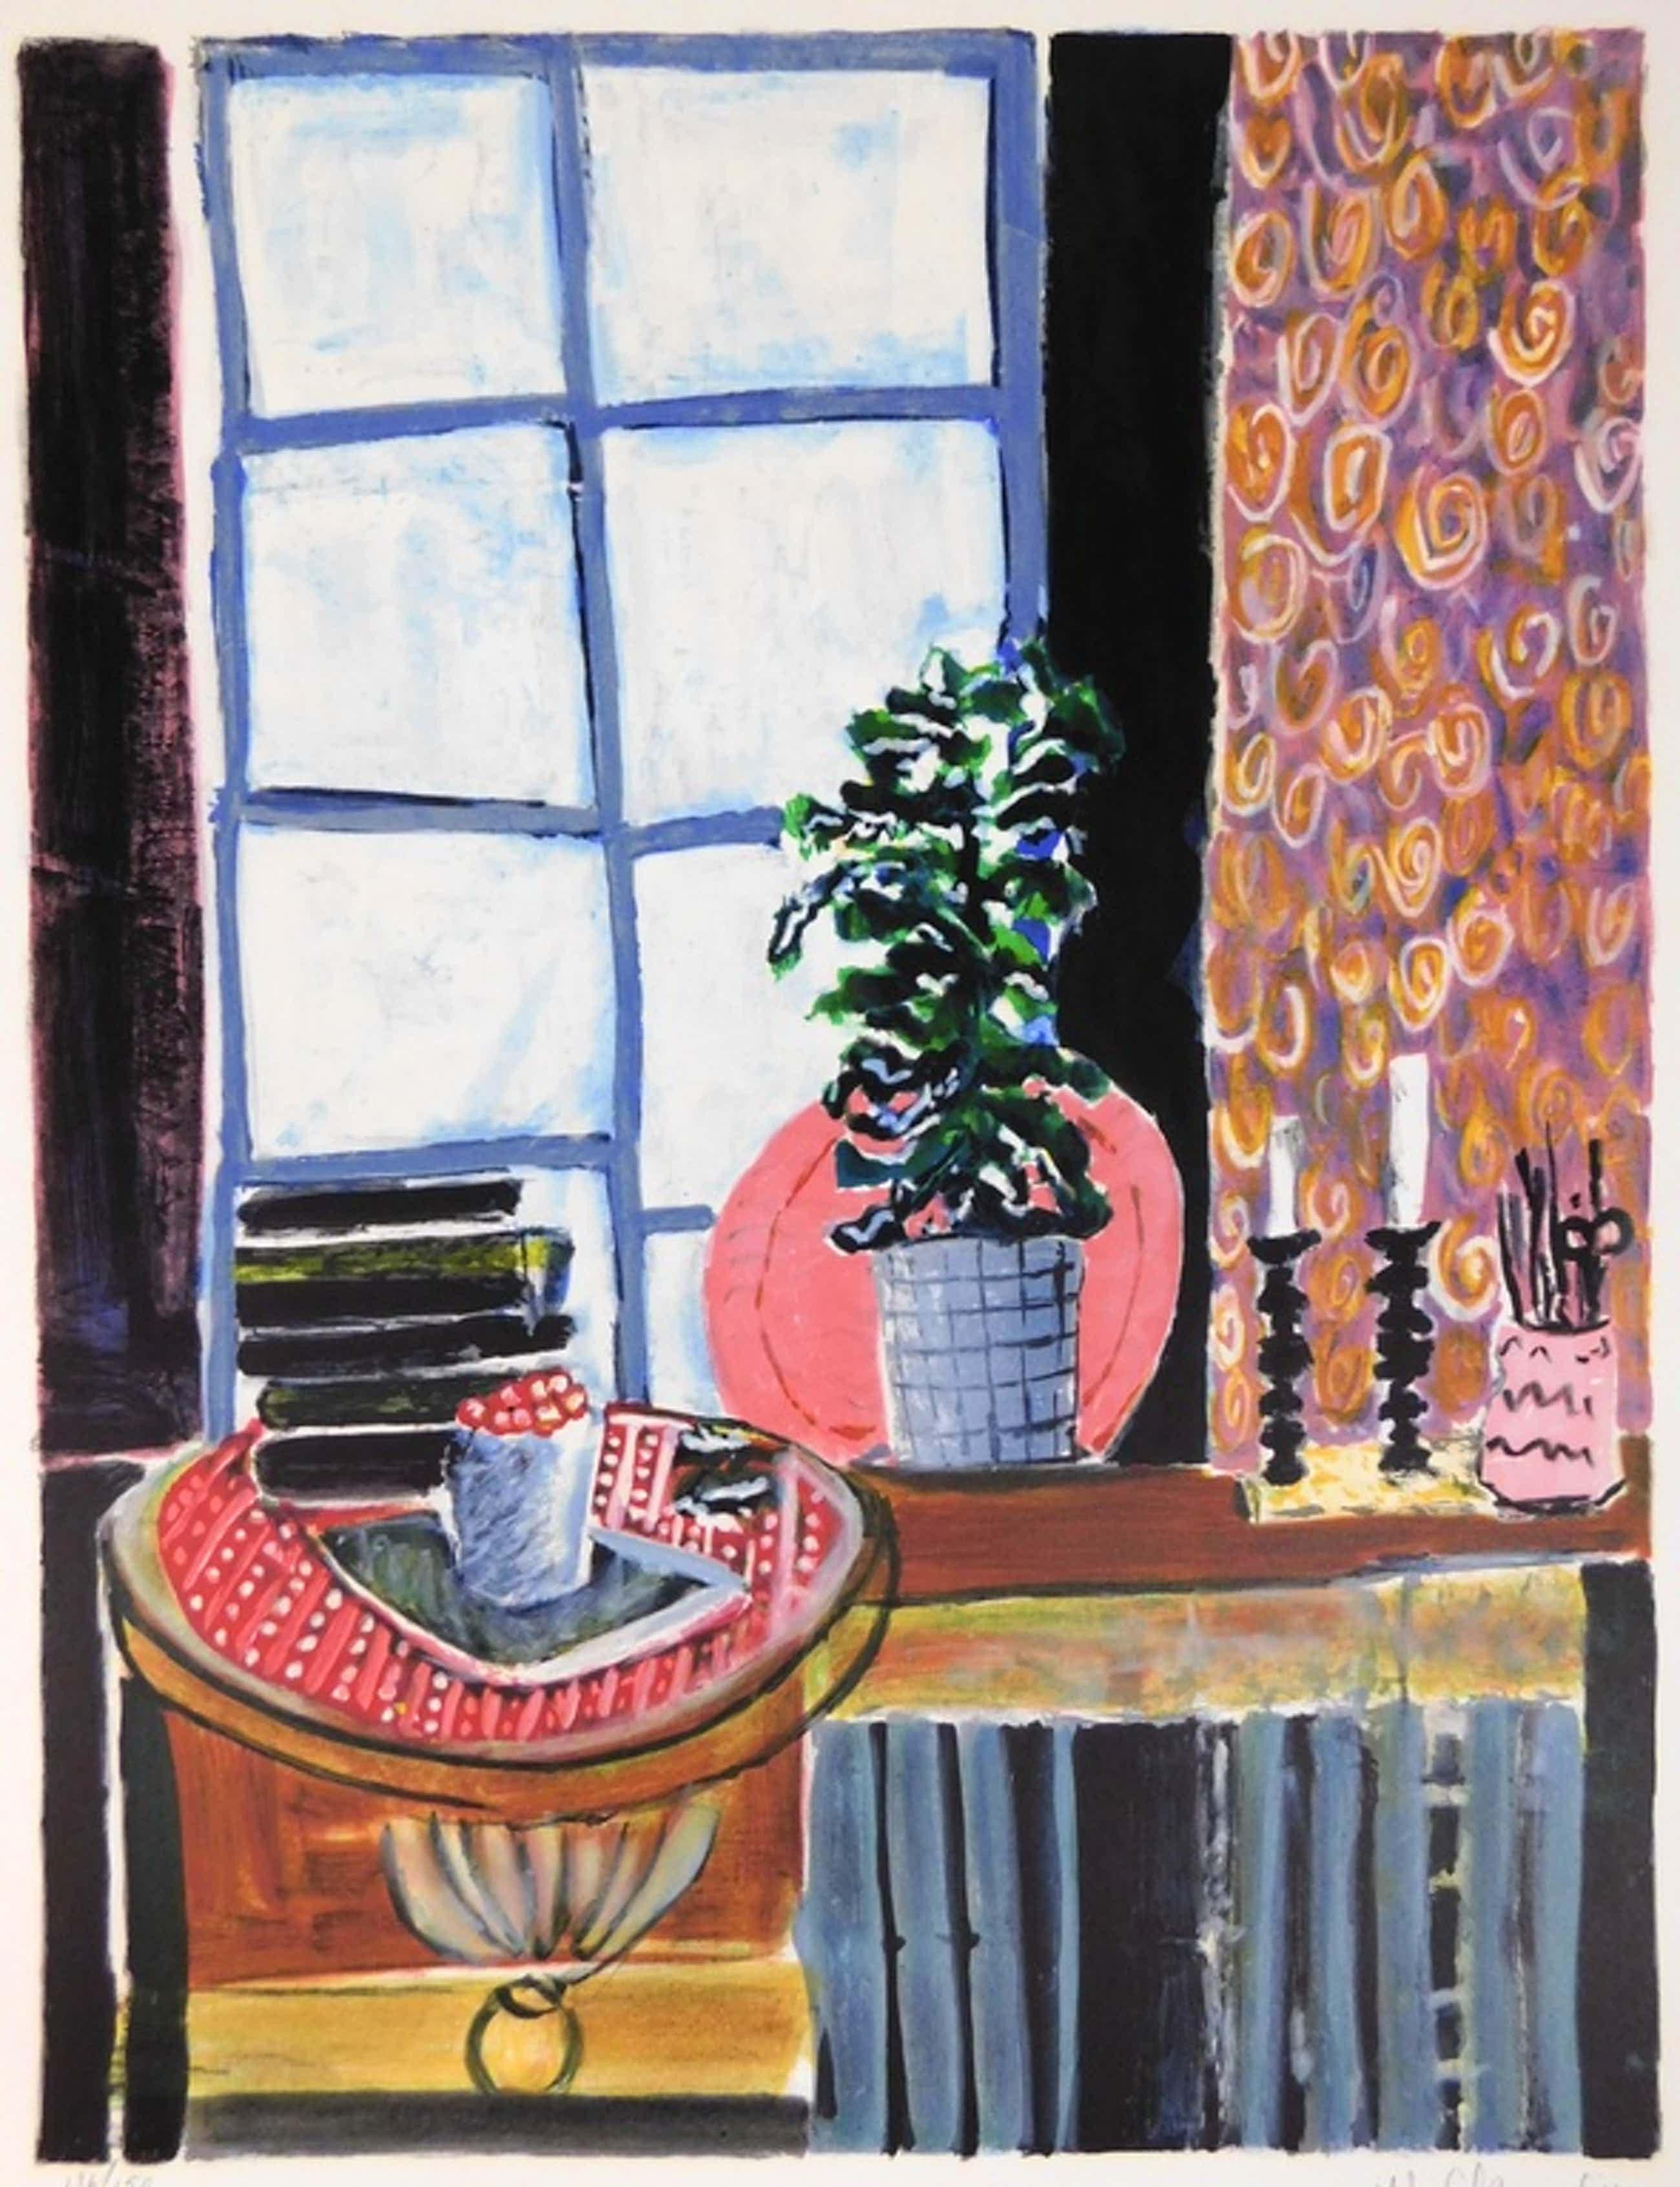 Wendy Chazin - Kleurenlitho - Still-life with Candlesticks kopen? Bied vanaf 75!